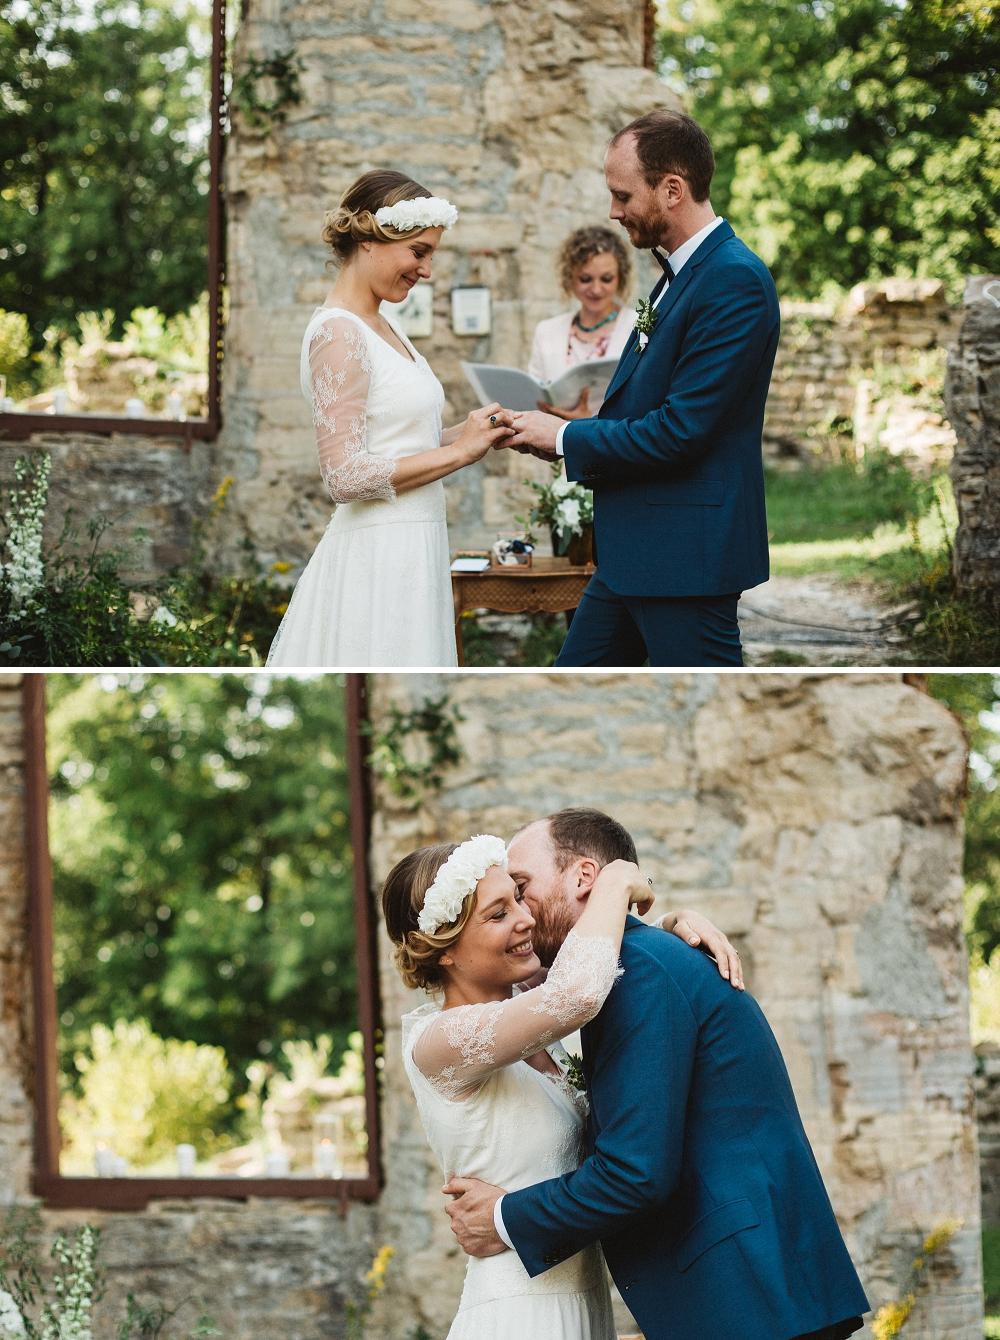 mariage-morimont-19.jpg